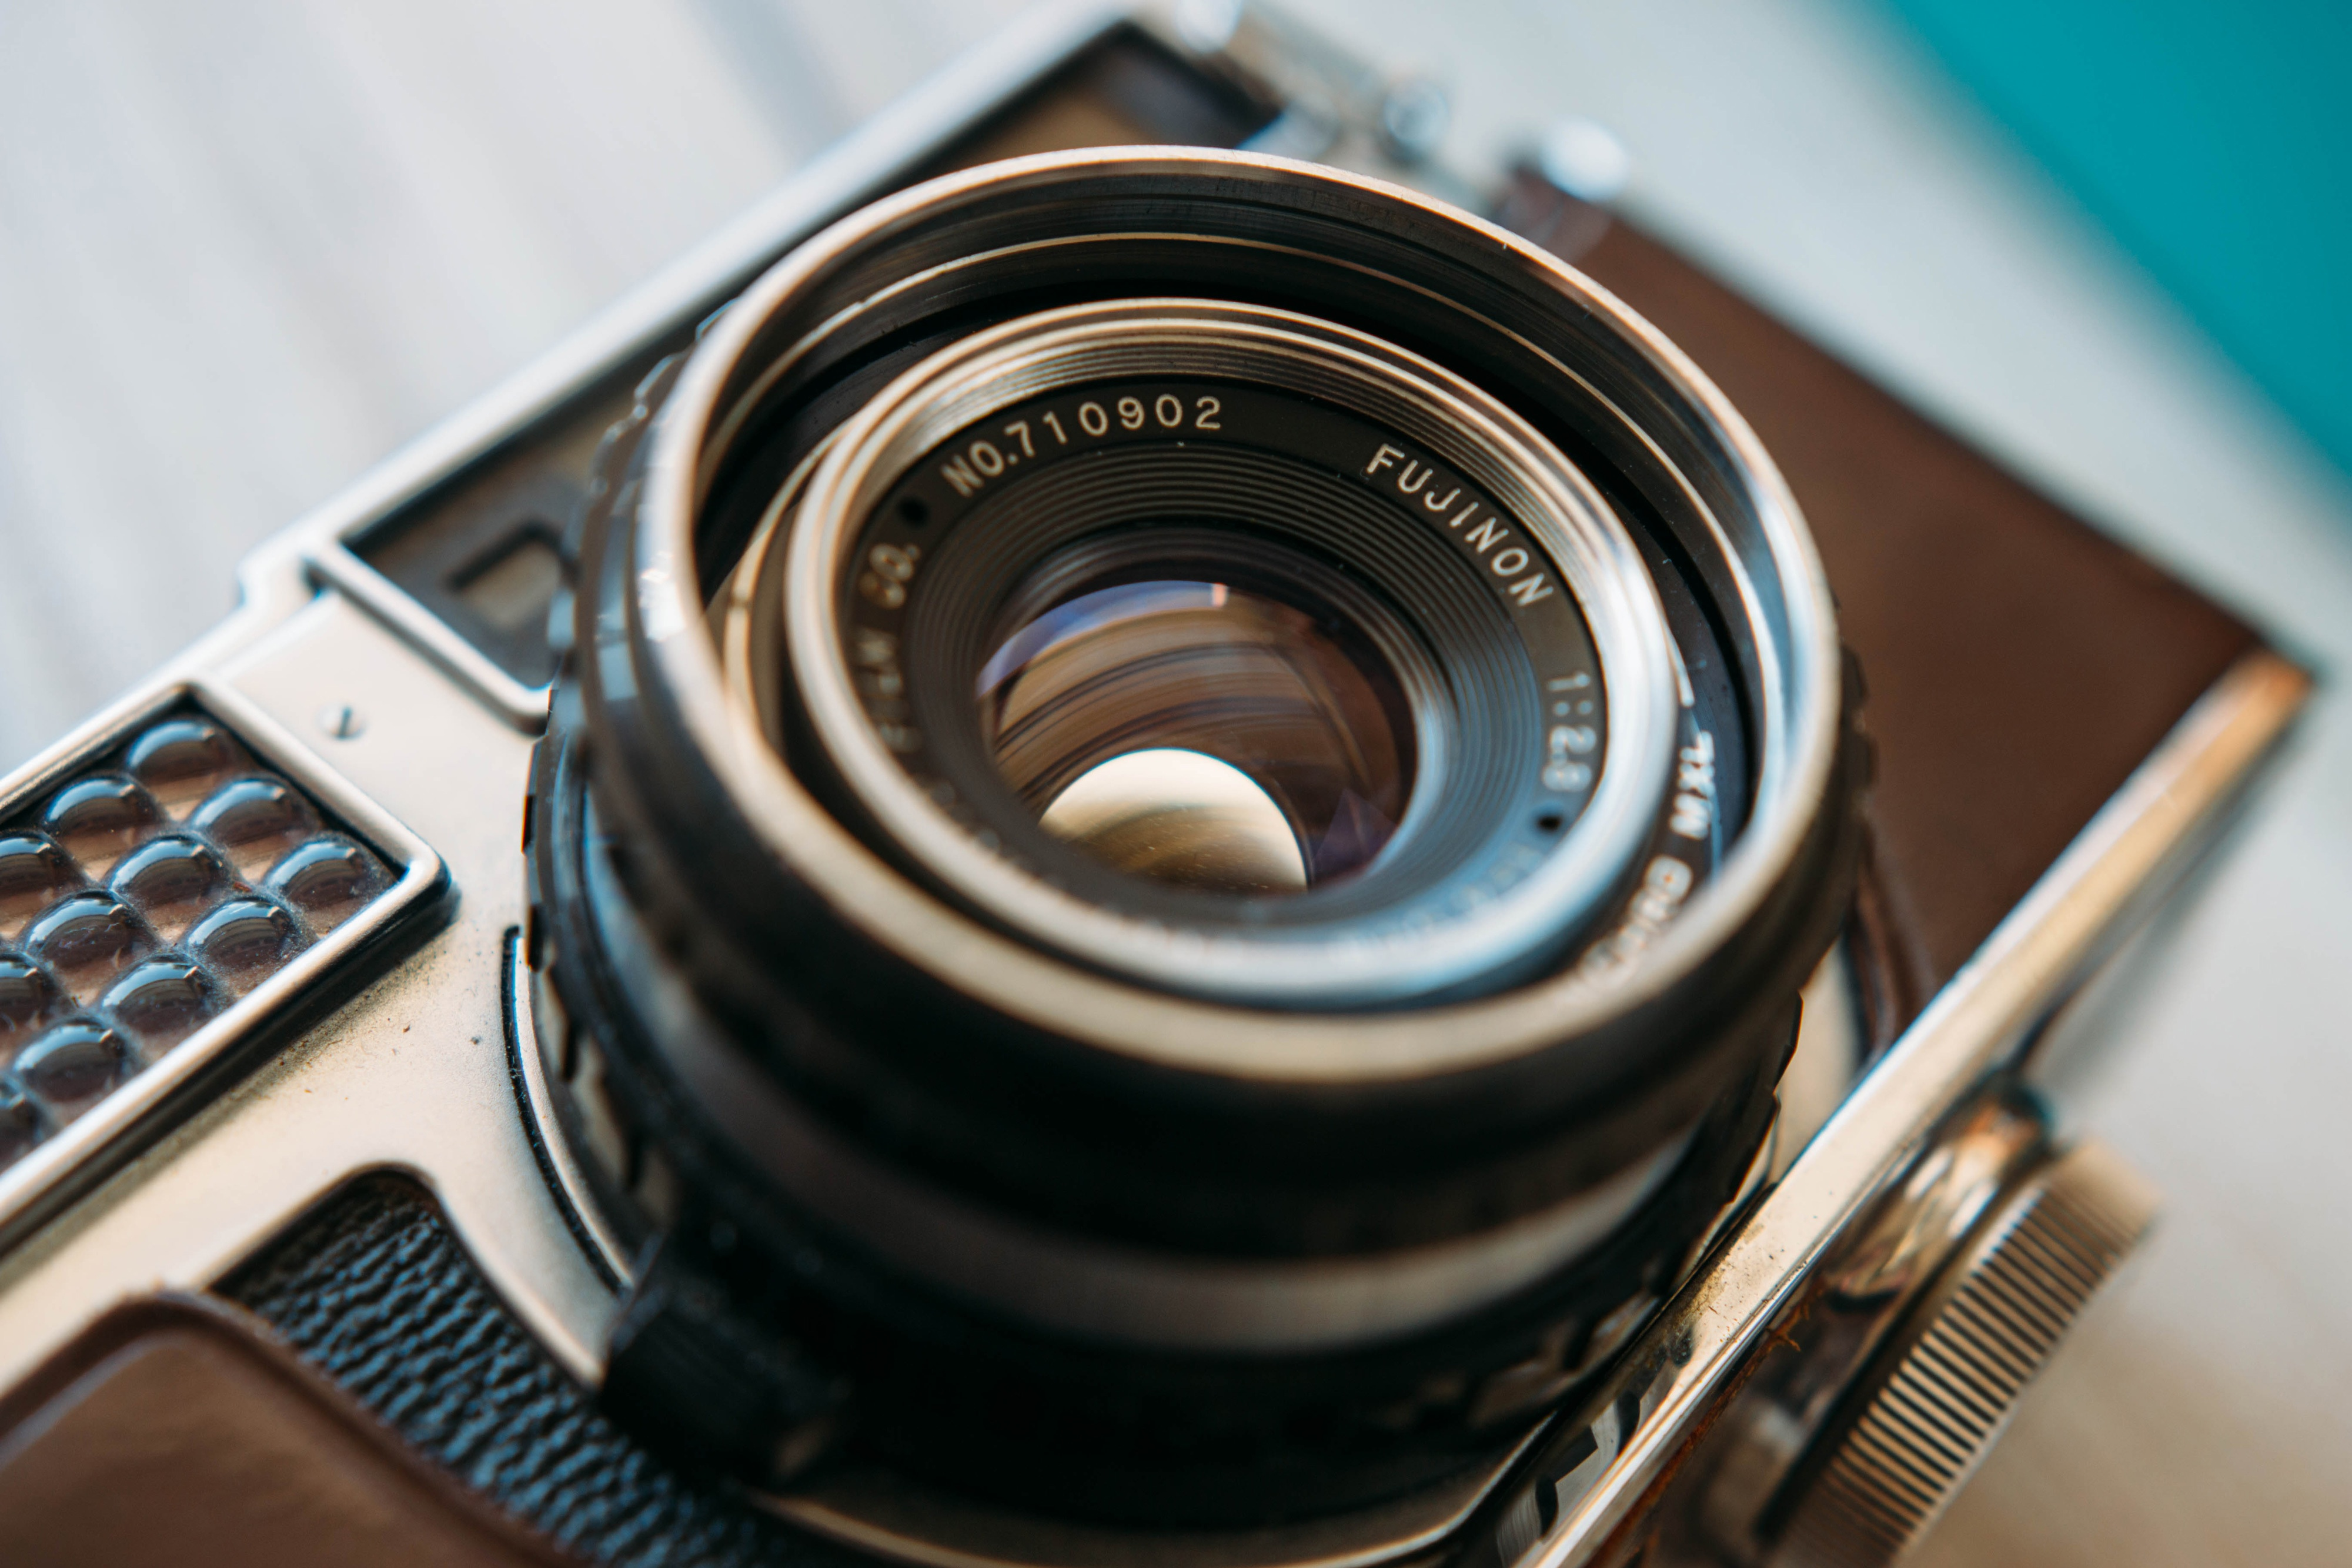 Camera, Passion, Photography, Lens, Capture, HQ Photo